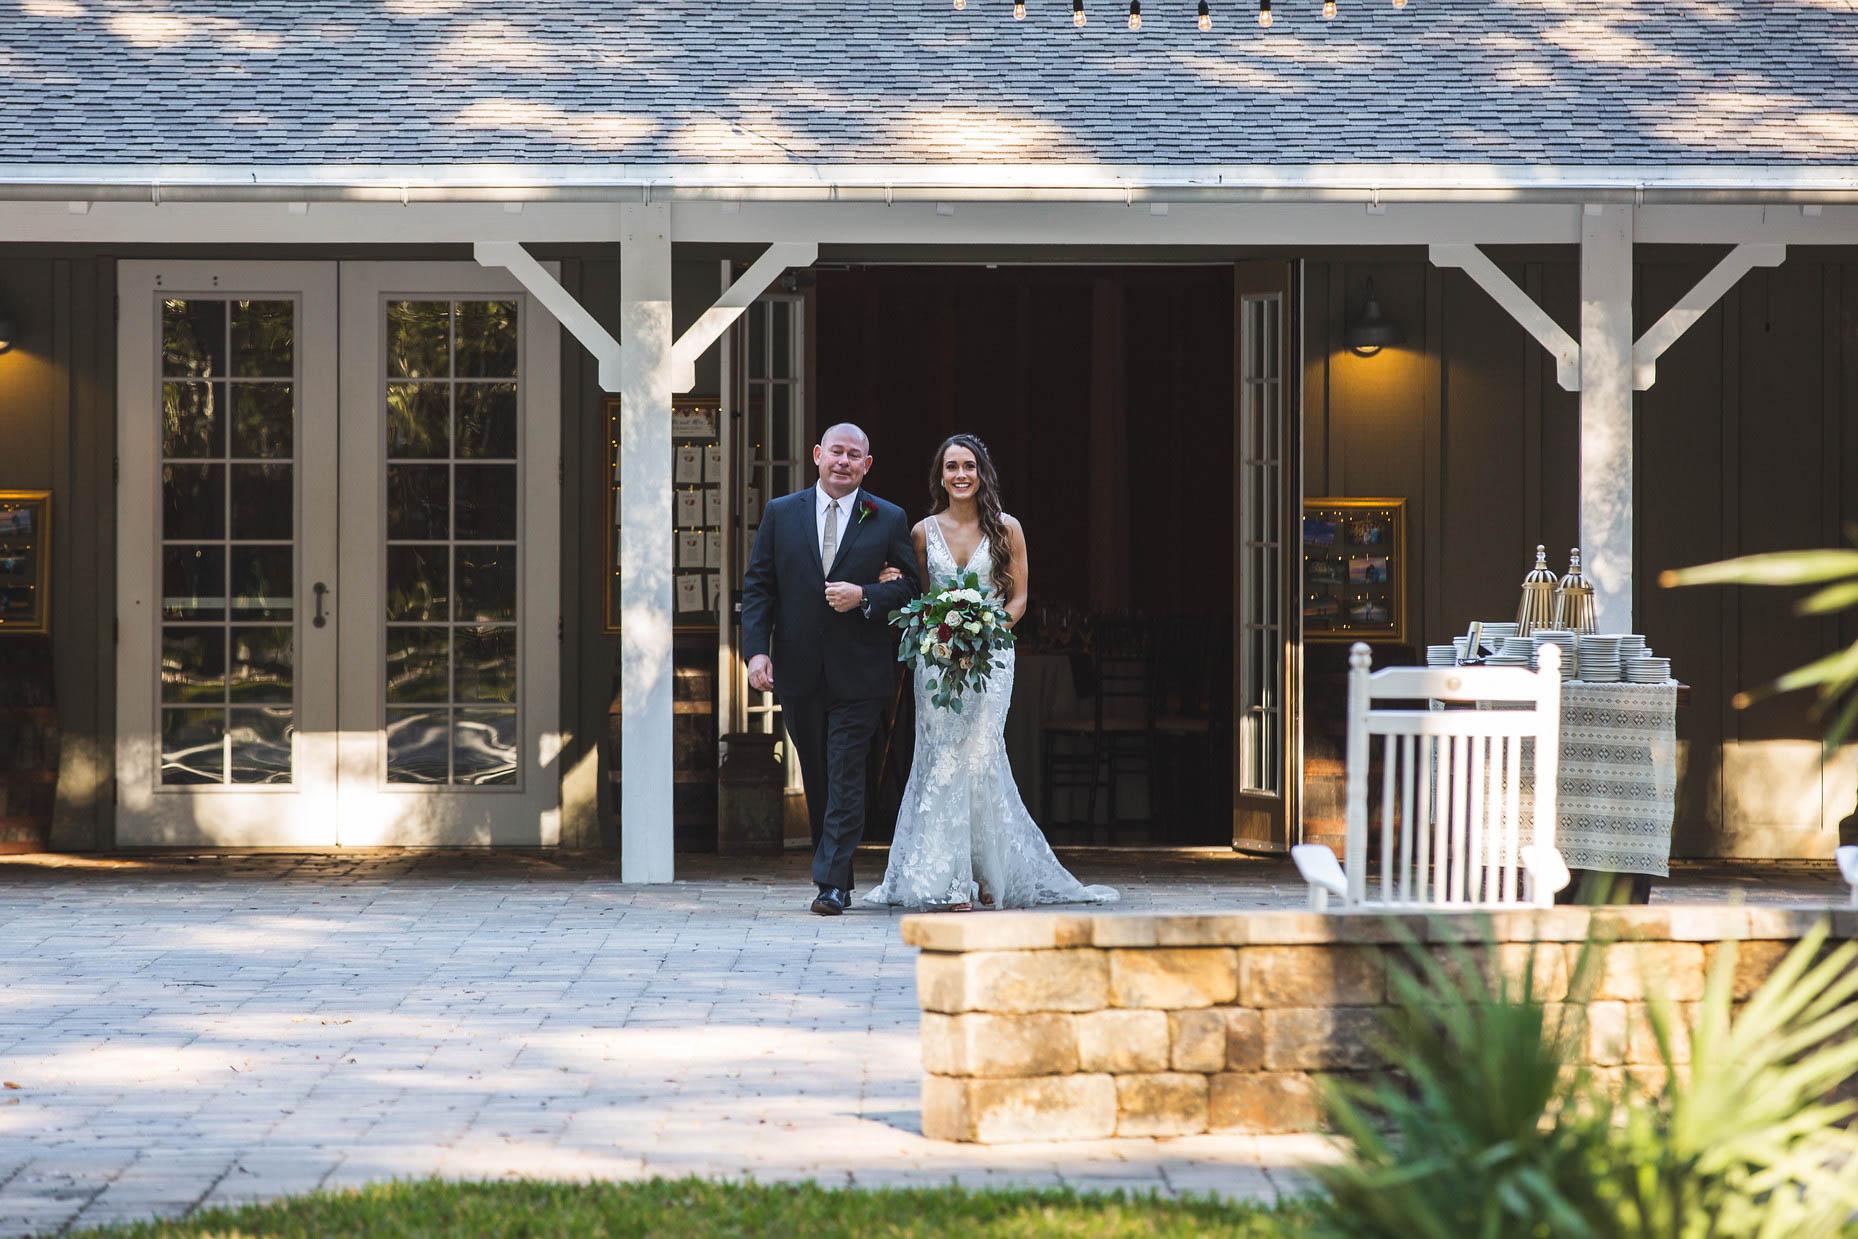 adam-szarmack-bowing-oaks-wedding-photographer-jacksonville-70.jpg